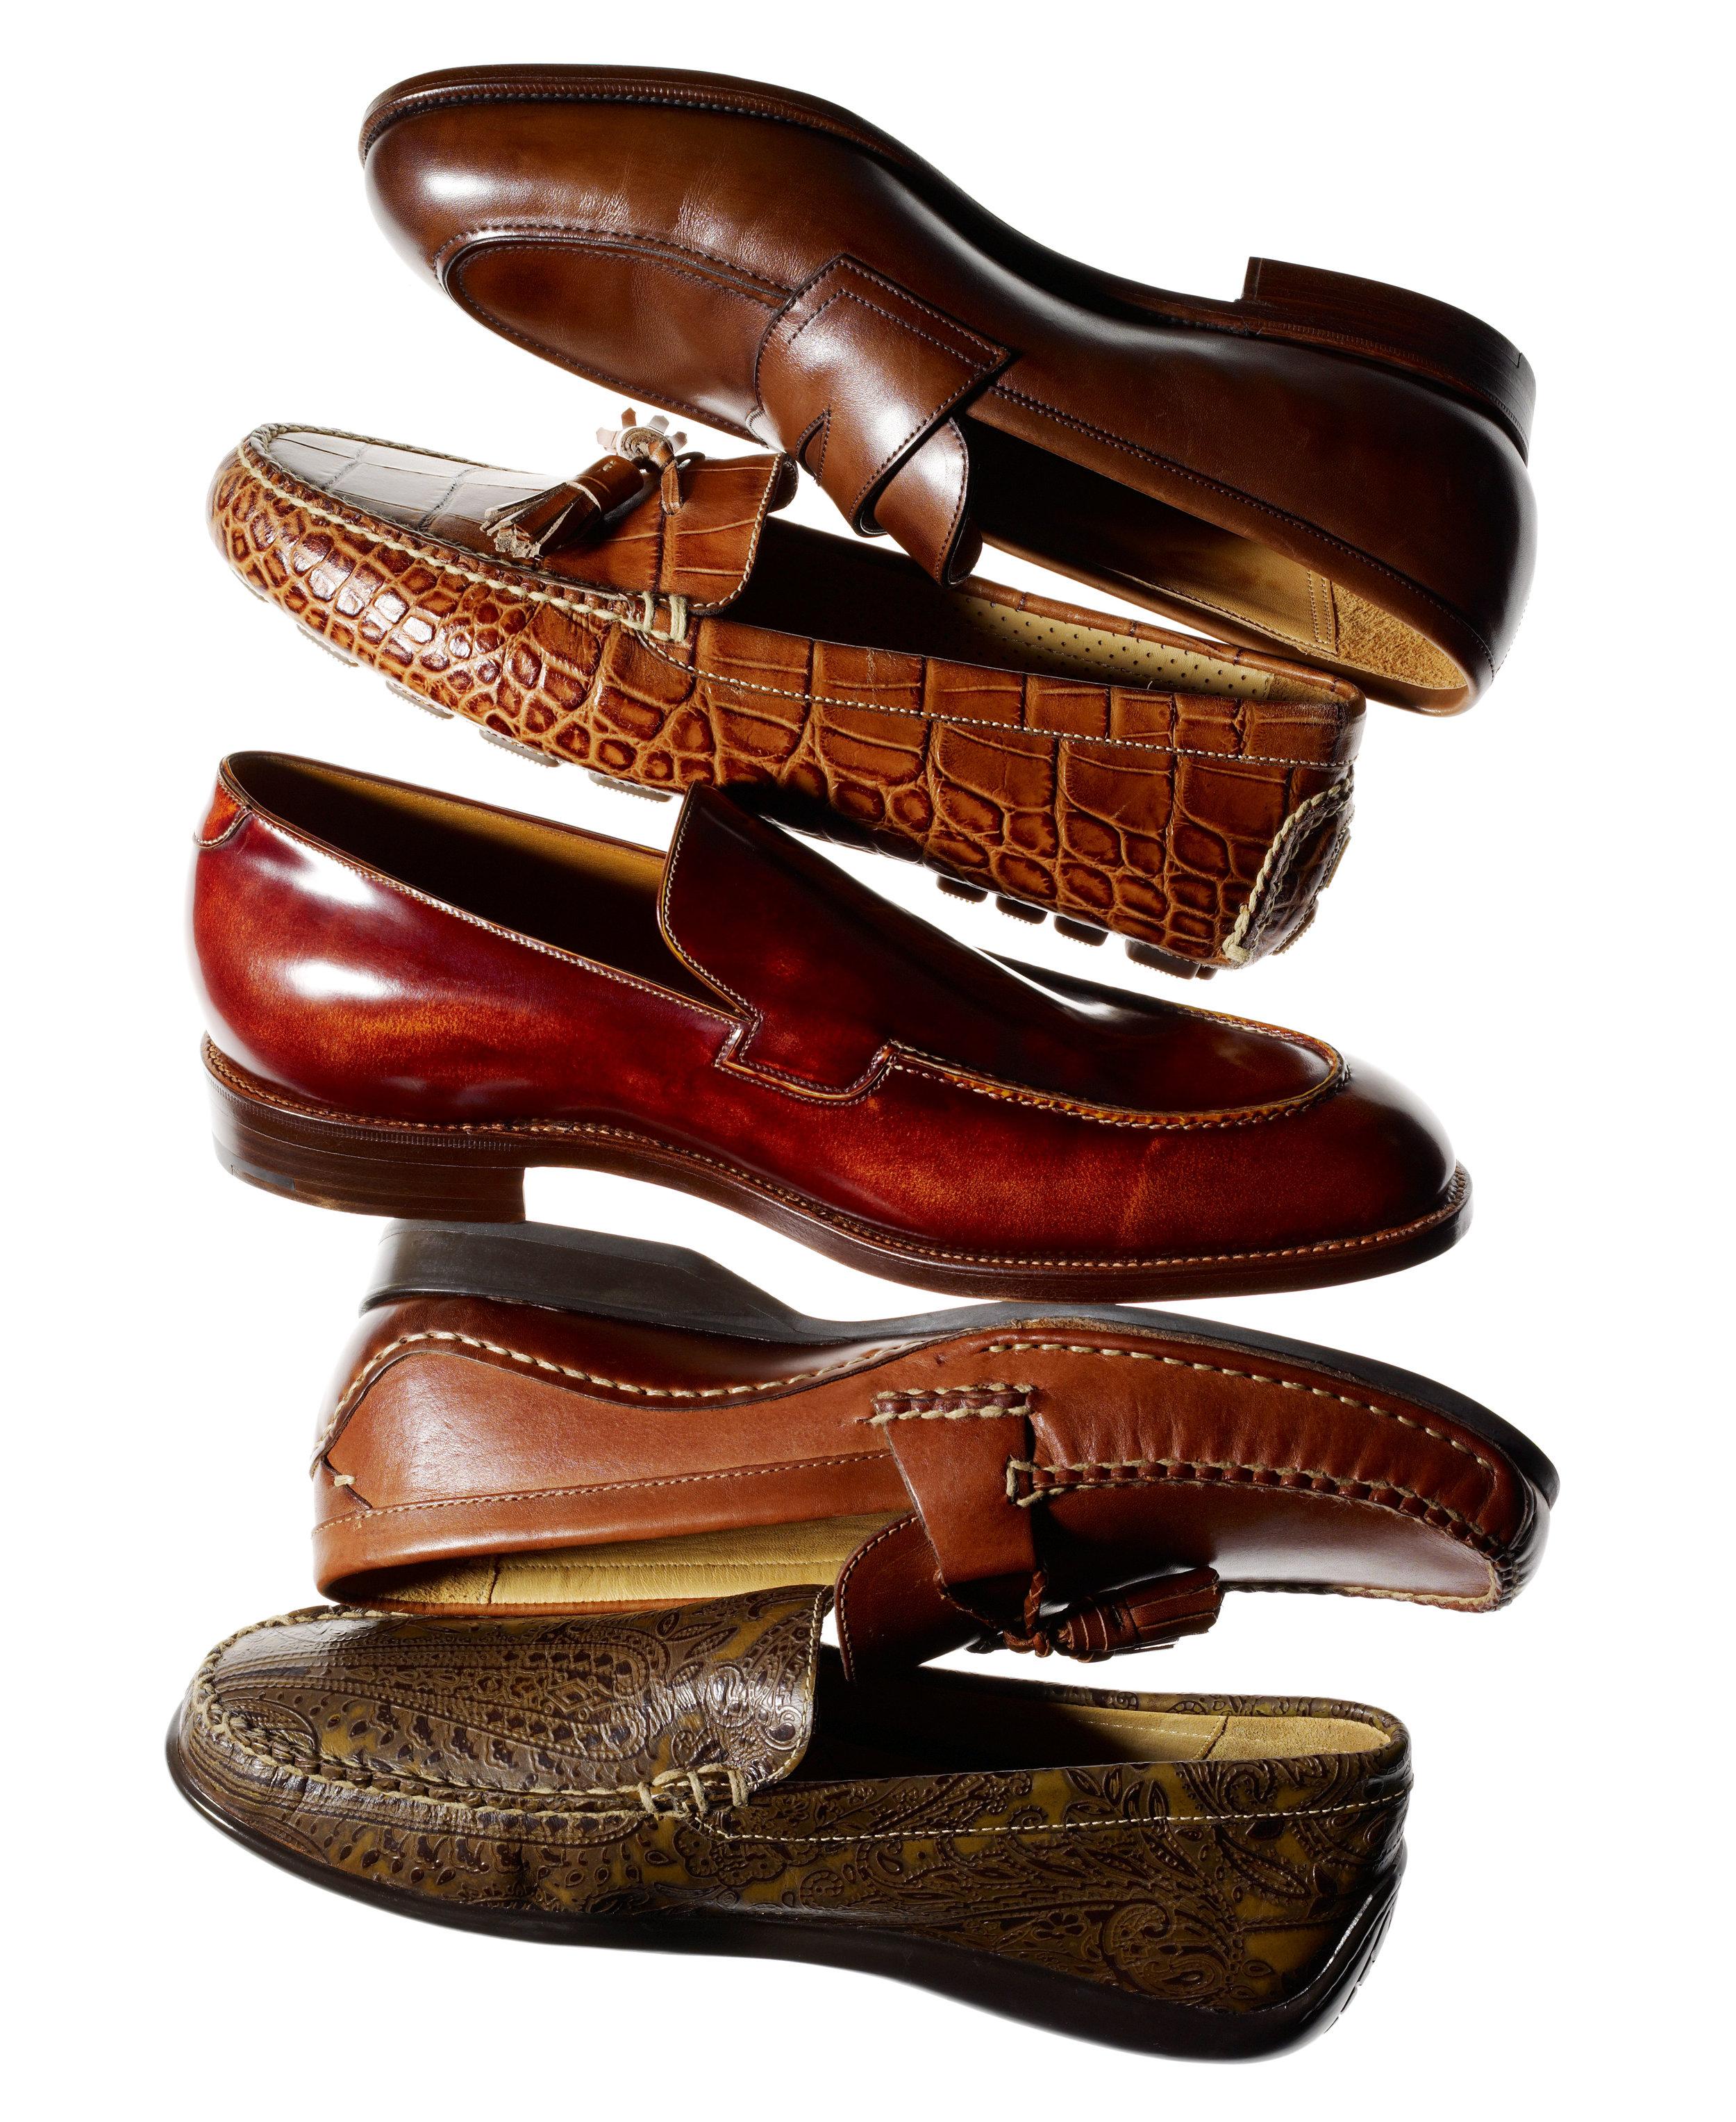 Shoes_022.jpg